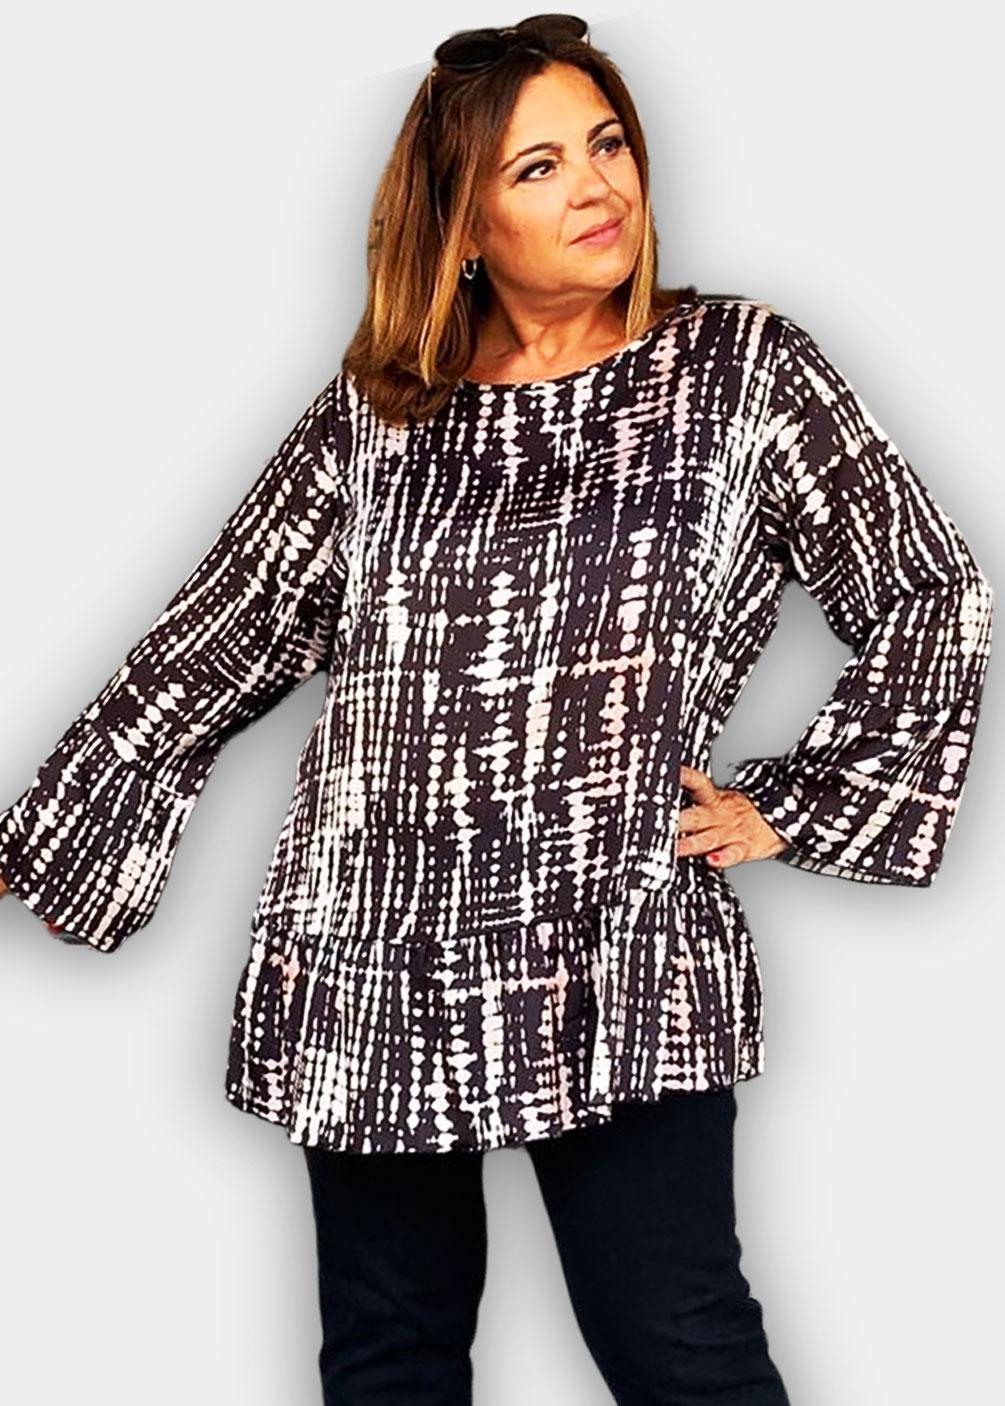 camiseta blusa tallas grandes indra invierno 2021